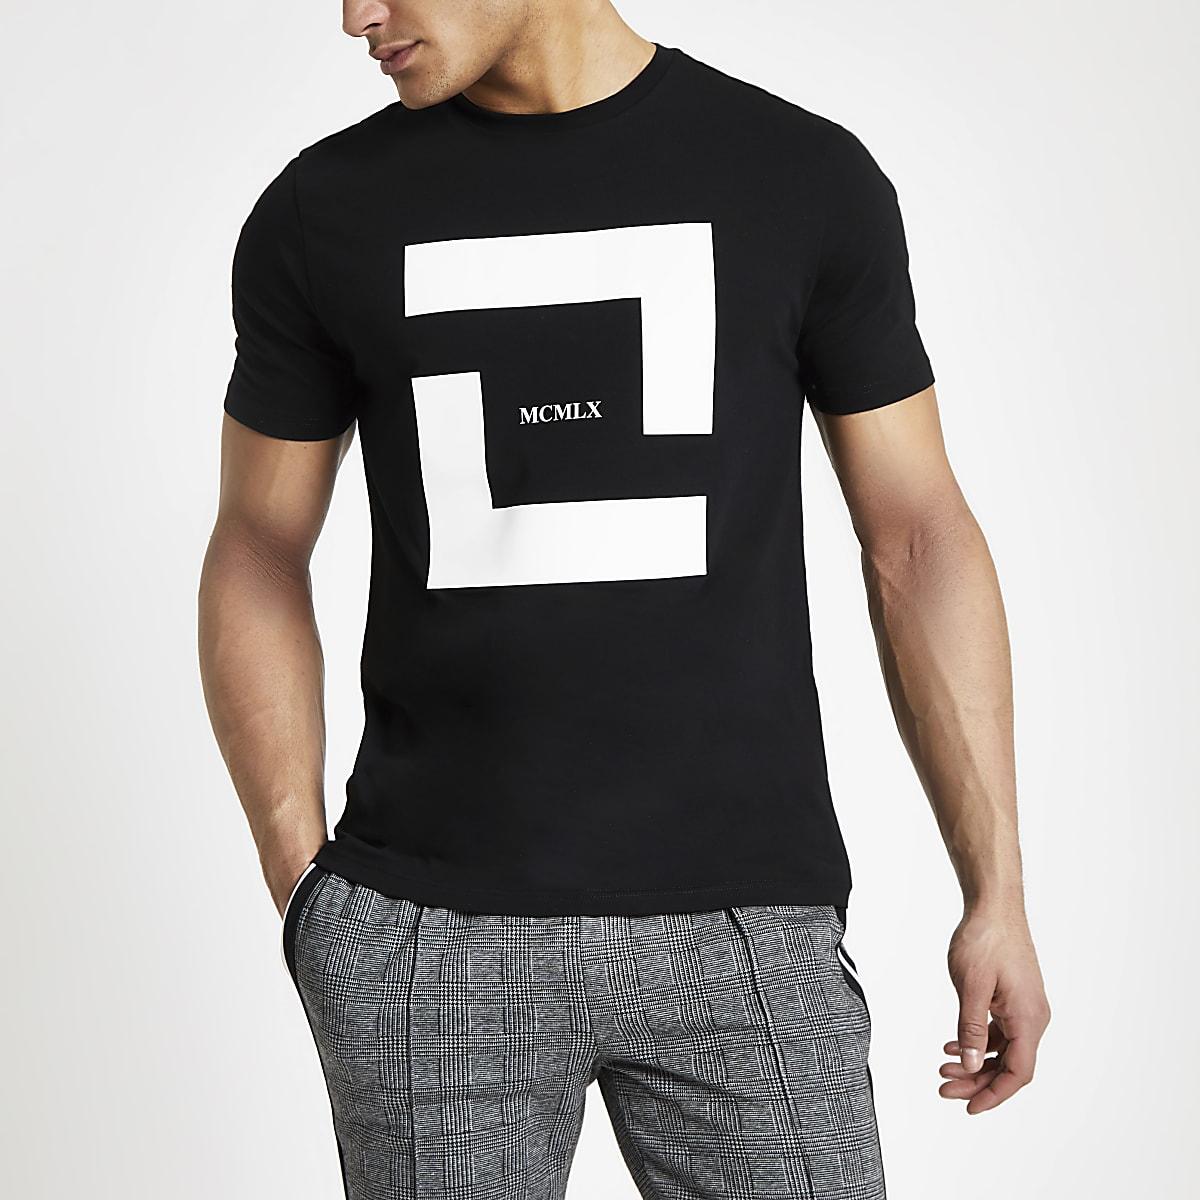 Black 'MCMXL' slim fit short sleeve T-shirt